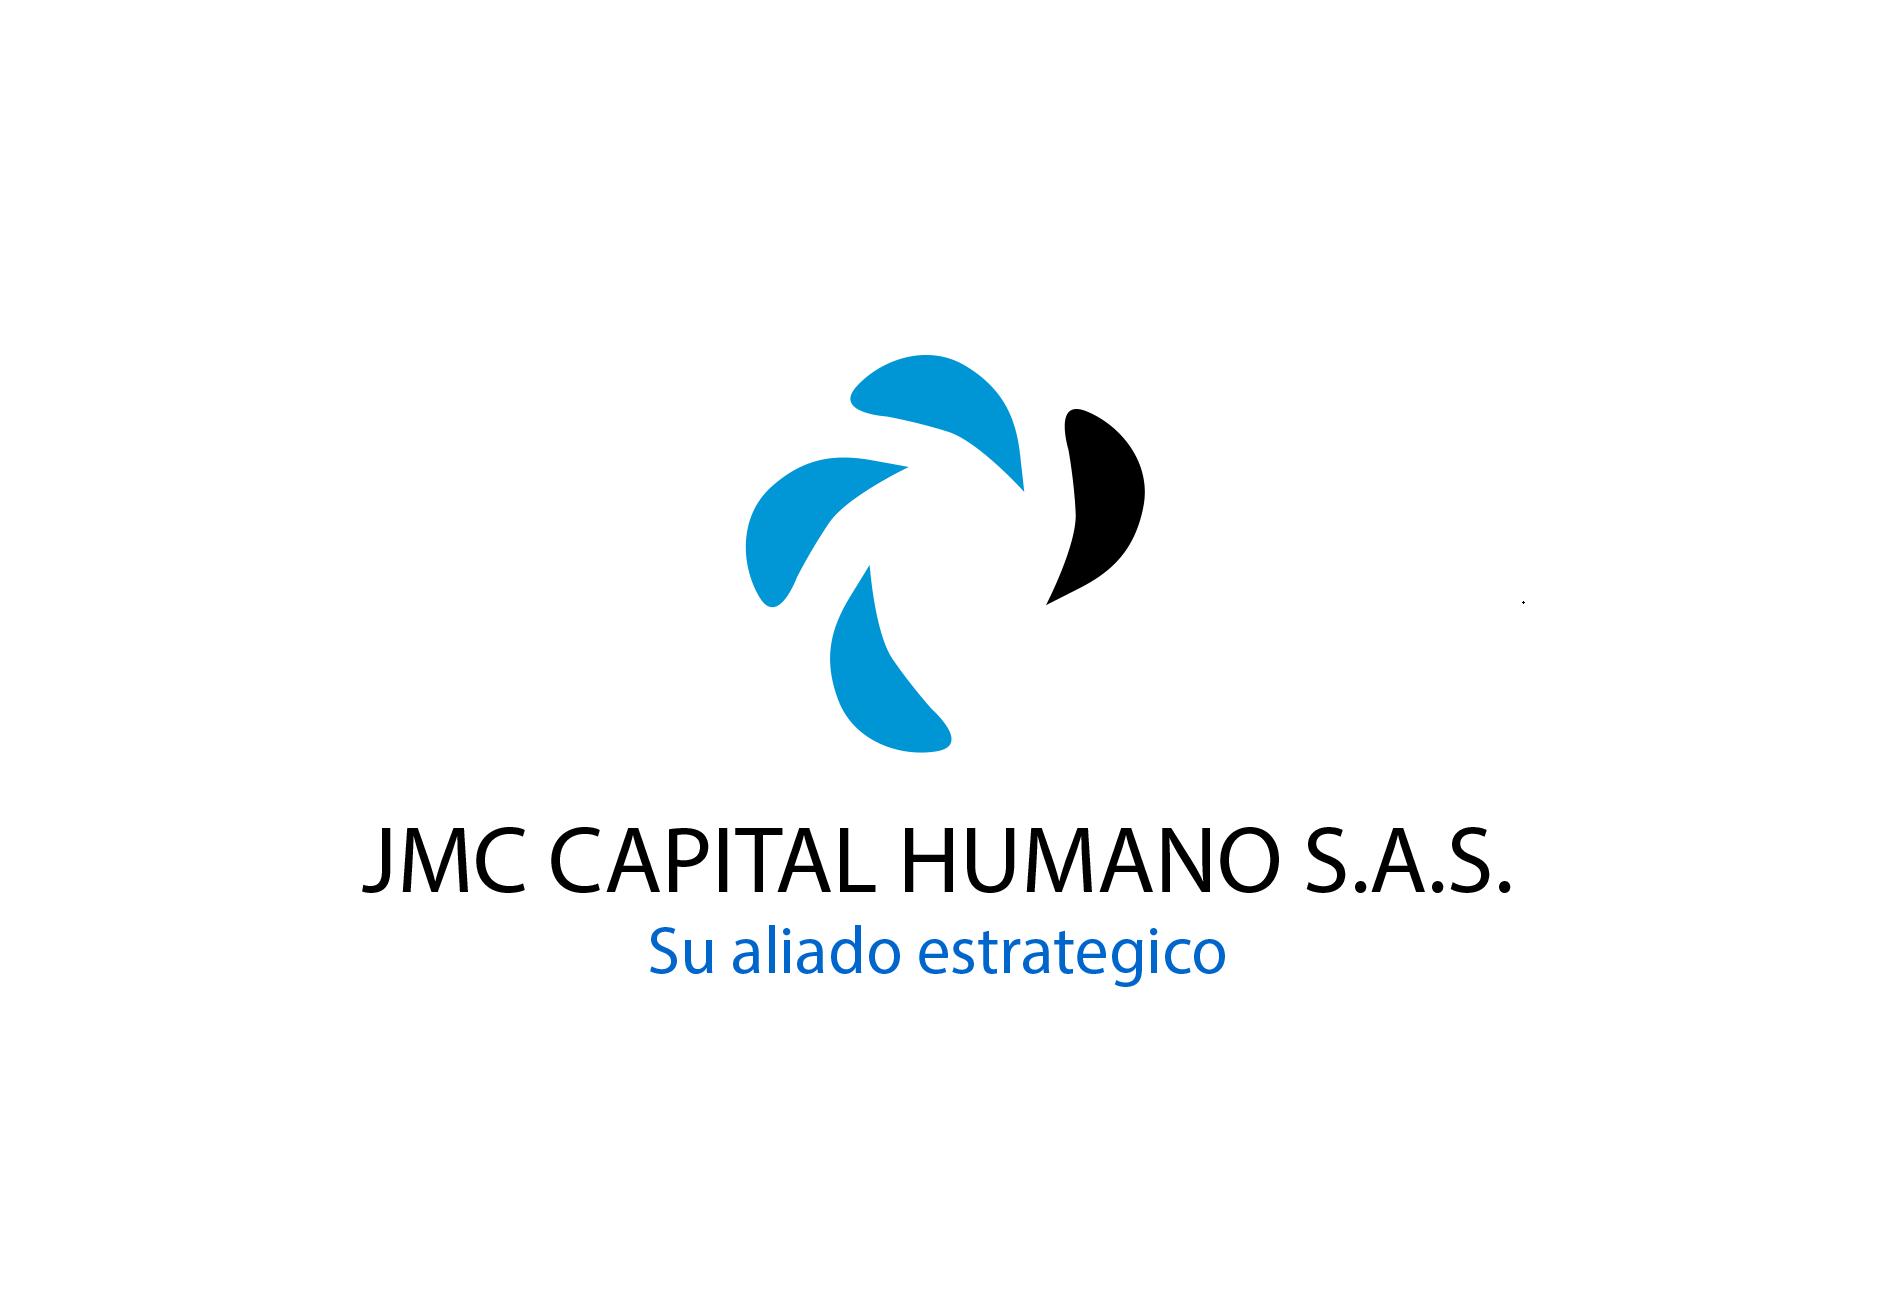 JMC CAPITAL HUMANO S.A.S.